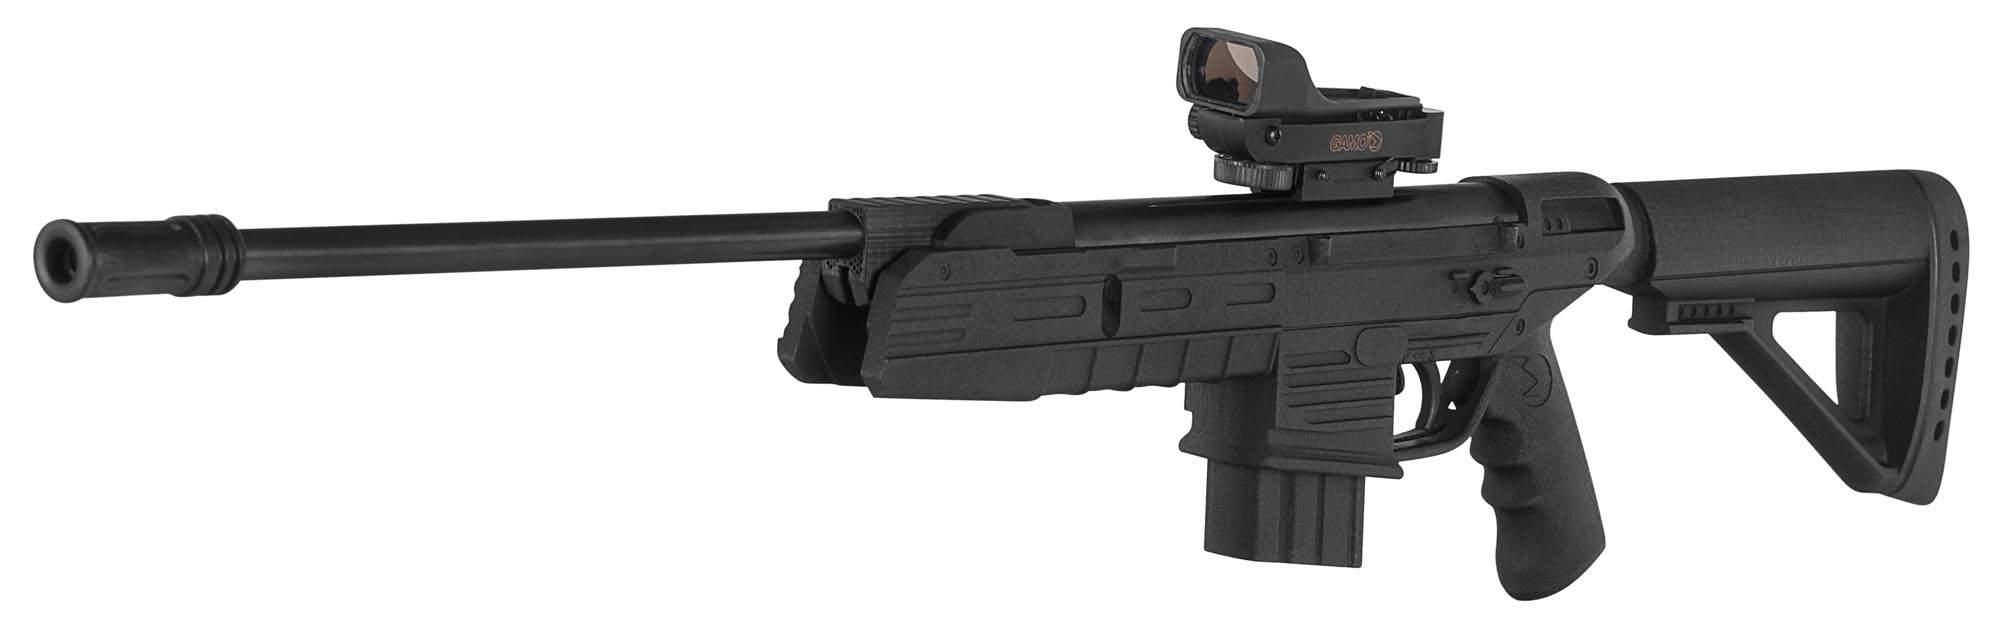 Carabine BROWNING X-BLADE - Page 3 161009021453984602